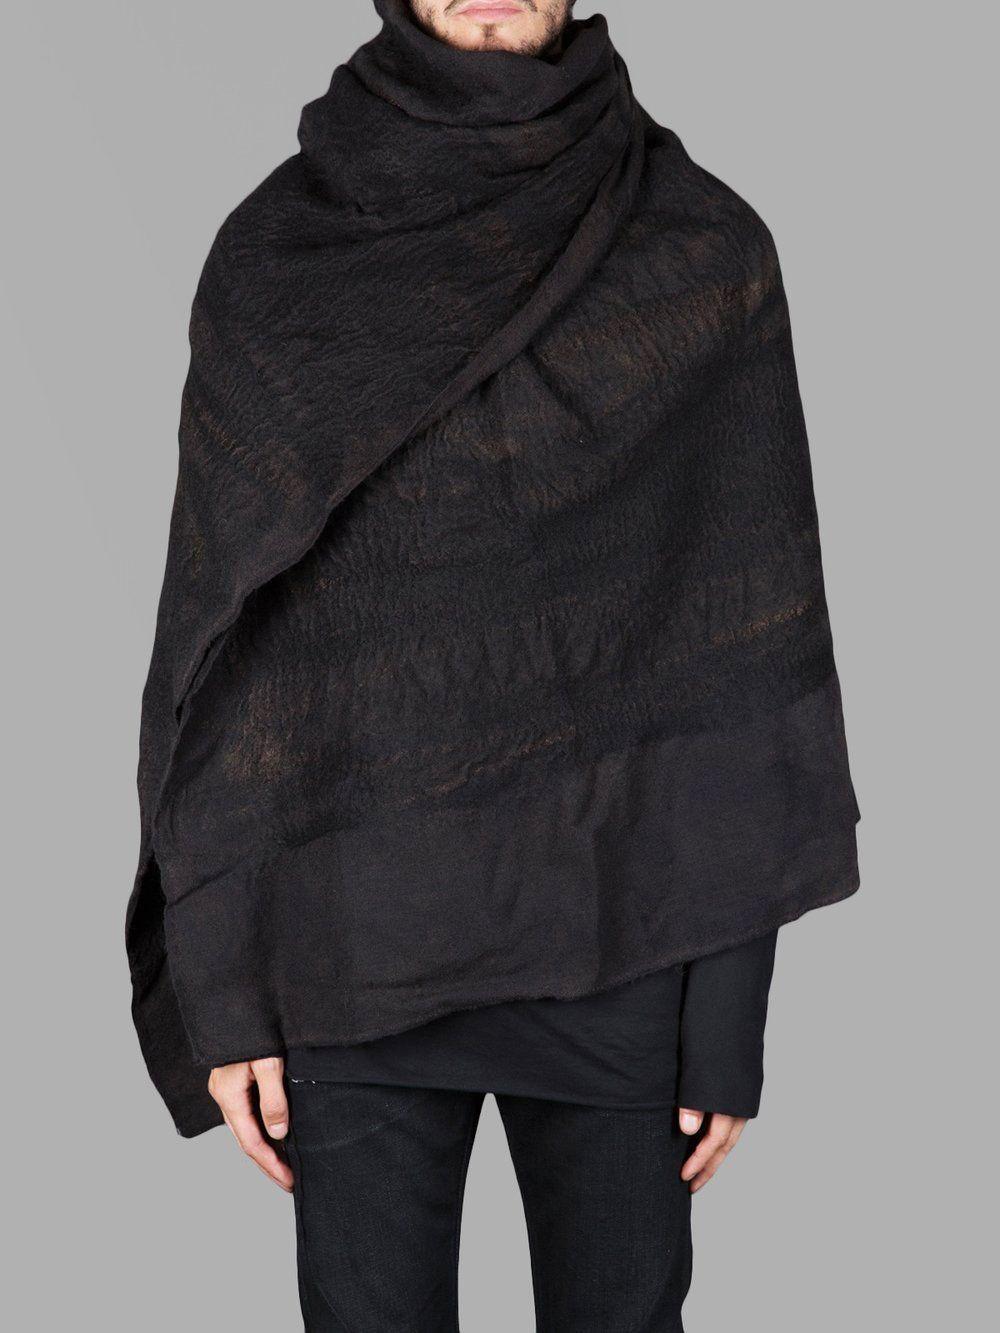 Biek Verstappen - scarf